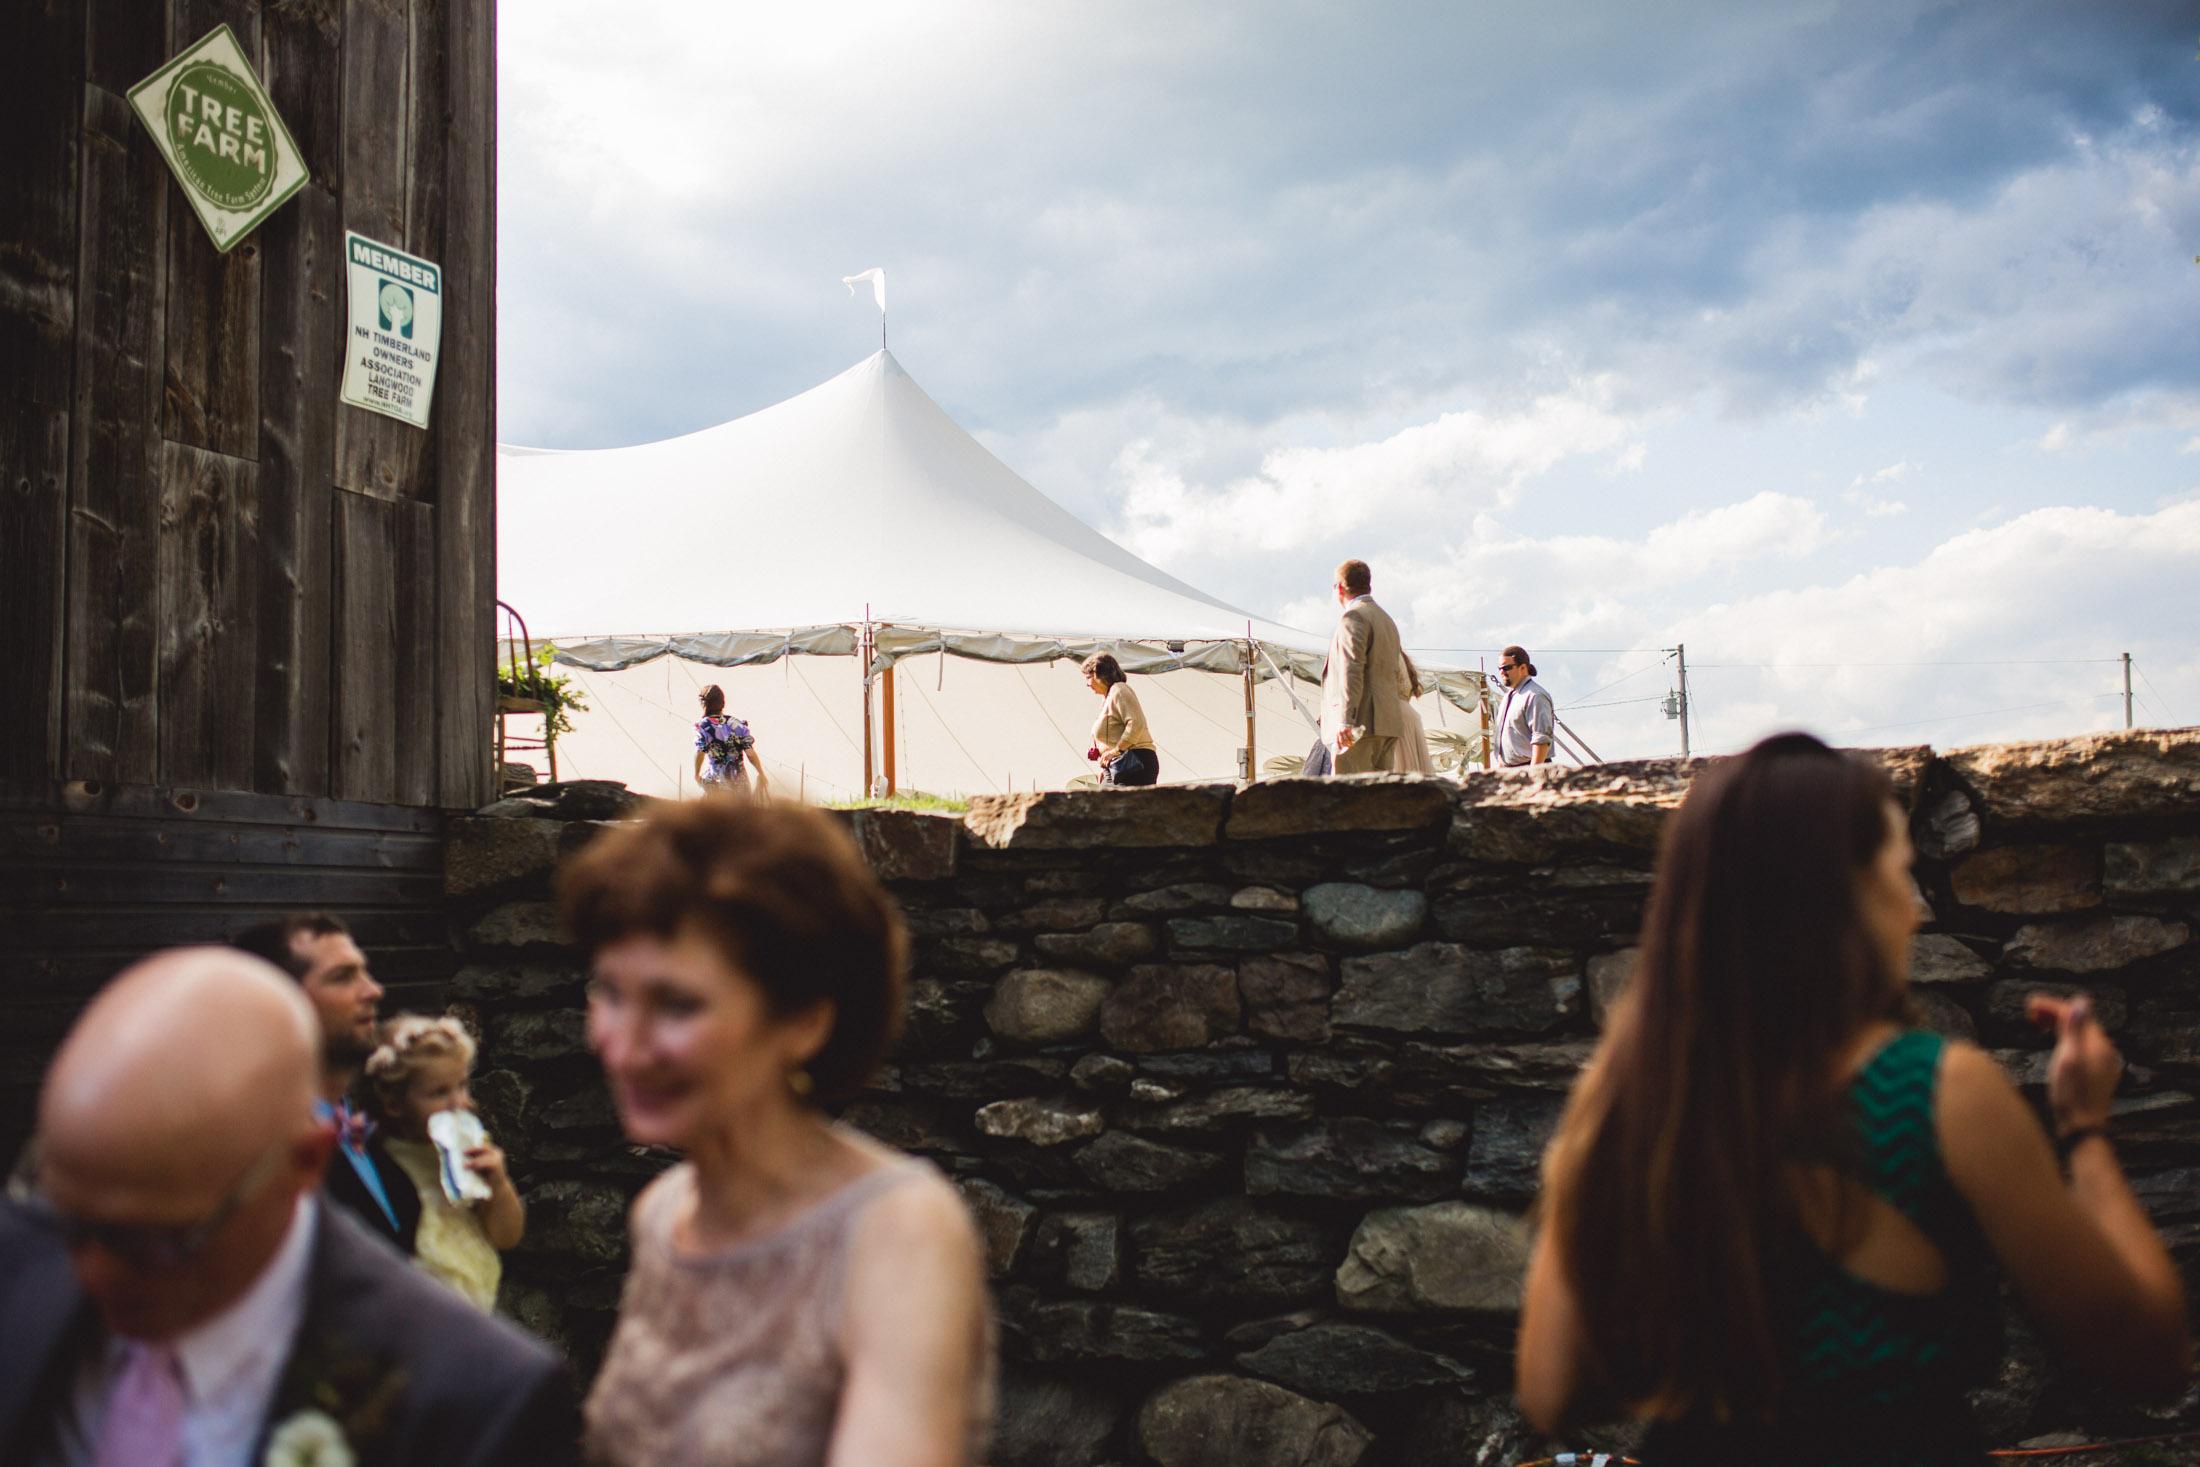 Wedding-Photography-1-5.jpg